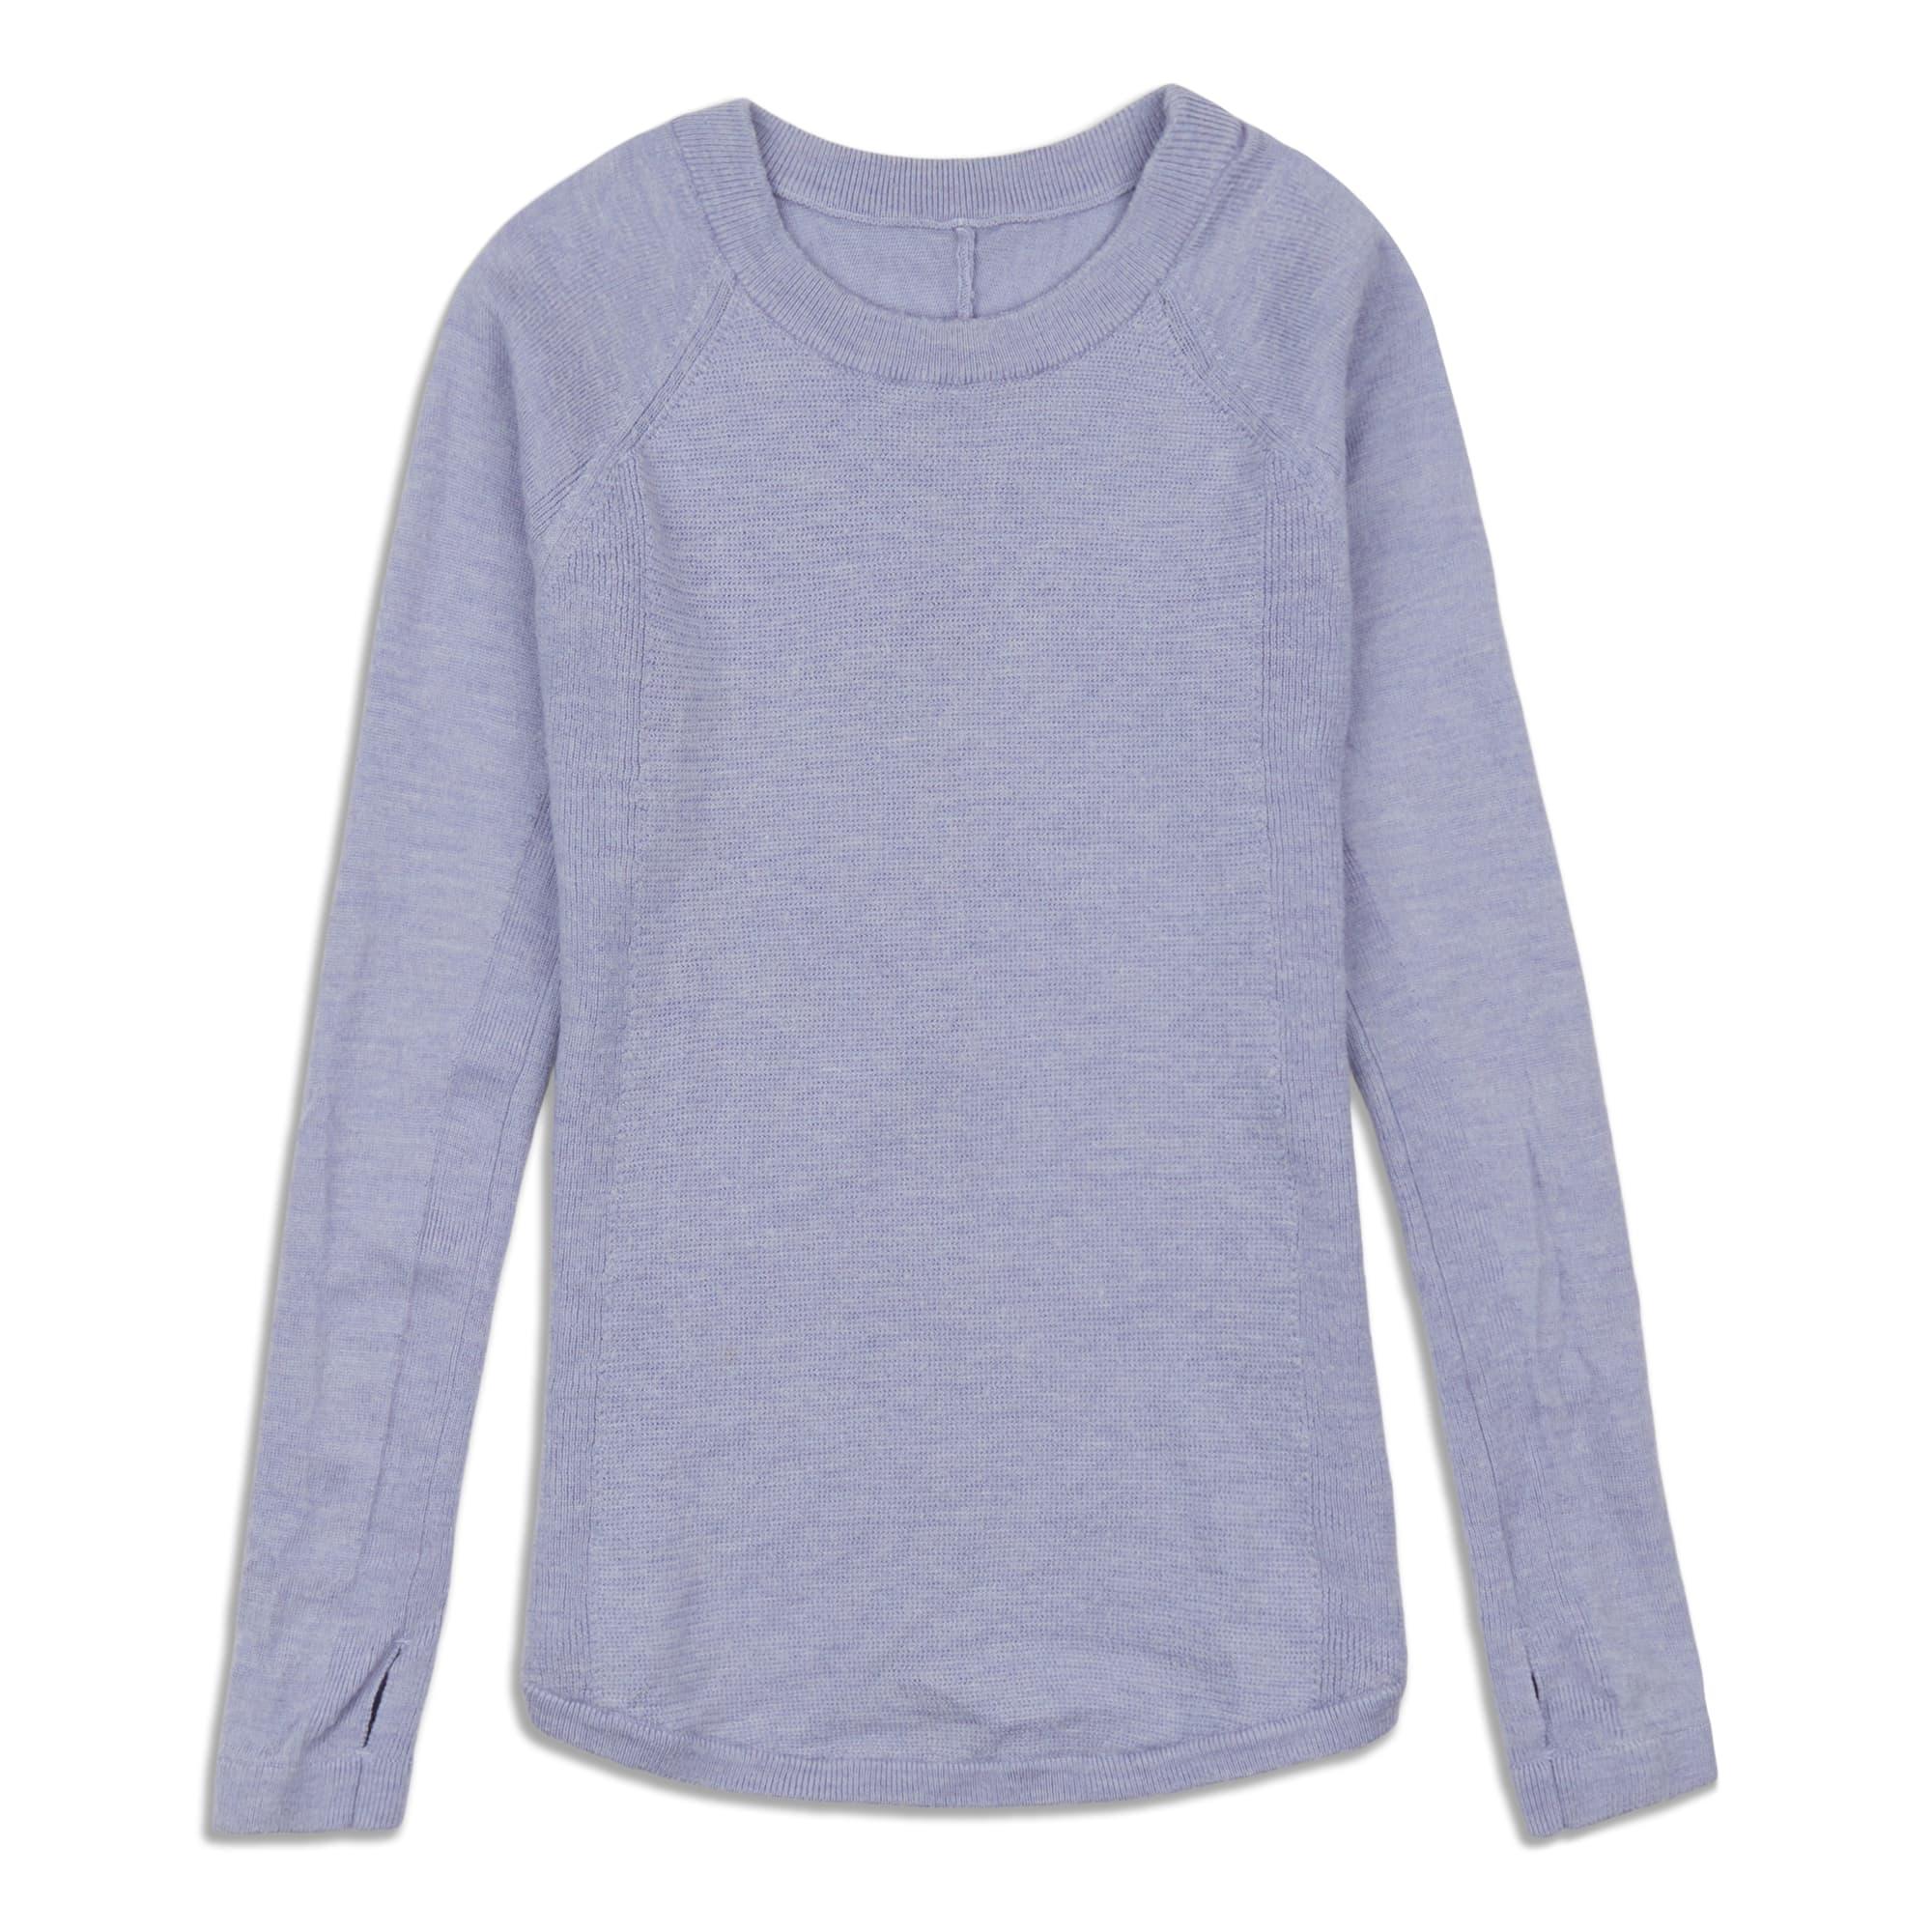 Main product image: Women's Sweatshirt - Resale